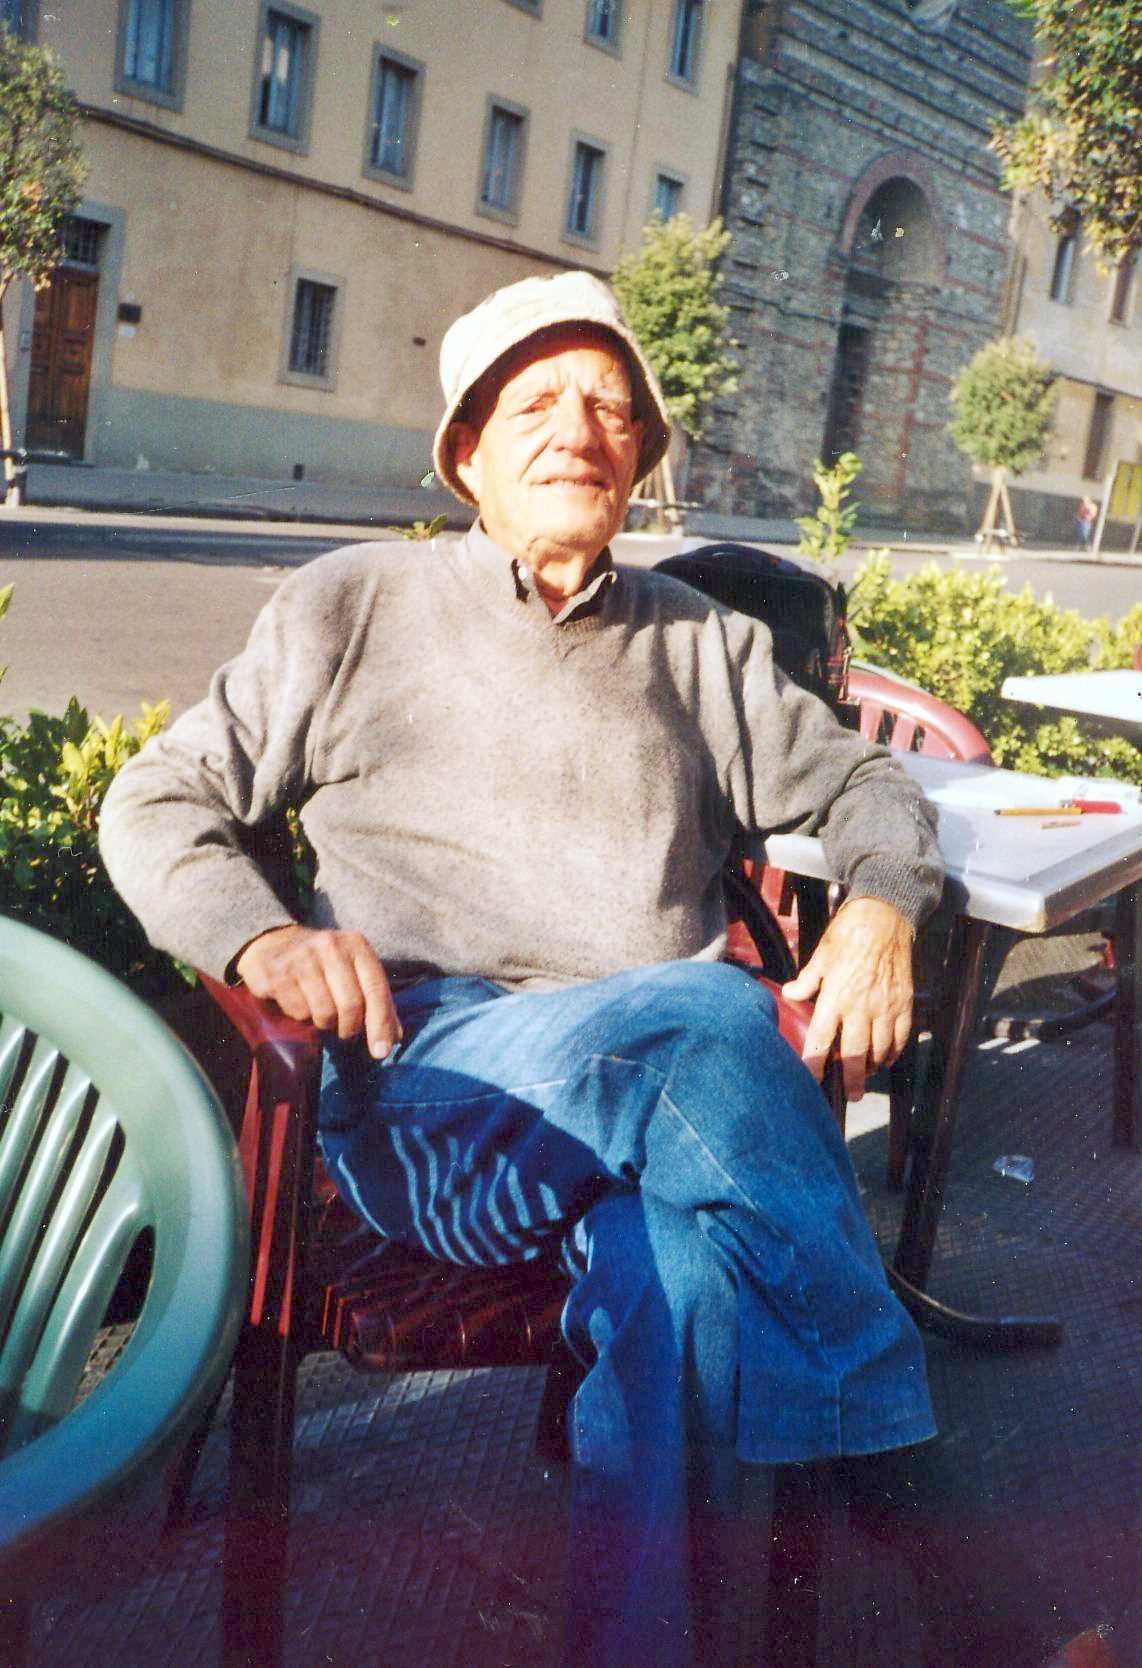 Artese Benesperi fotografiat per l'historiador Carlo Onofrio Gori (2004)